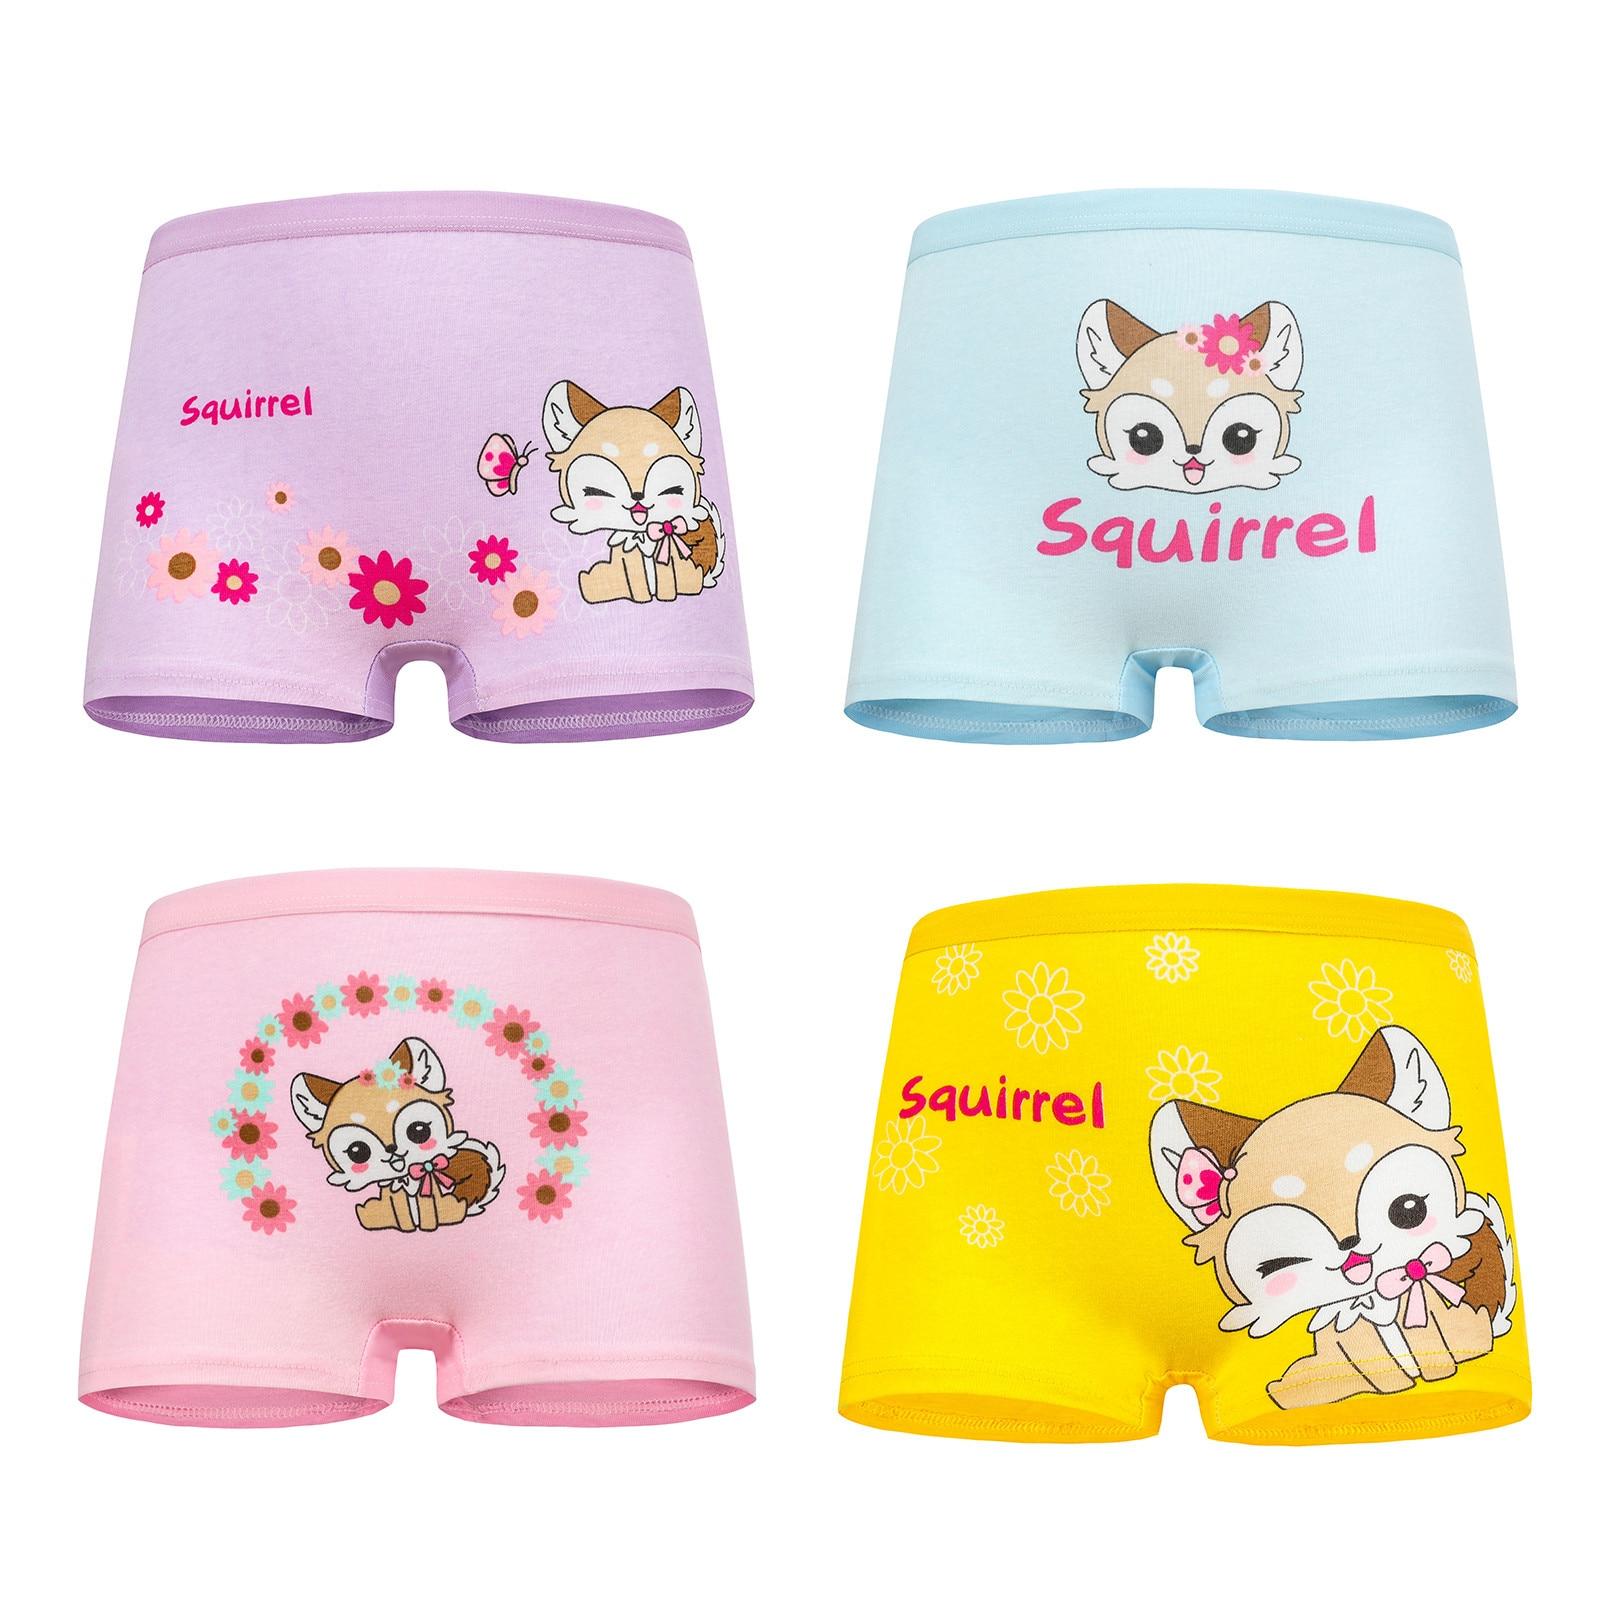 4 Pcs/lot New Children Cotton Panties Girls Underwear Cute Cartoon Printed Baby girls Kids Boxers Briefs Soft Panties for Girl